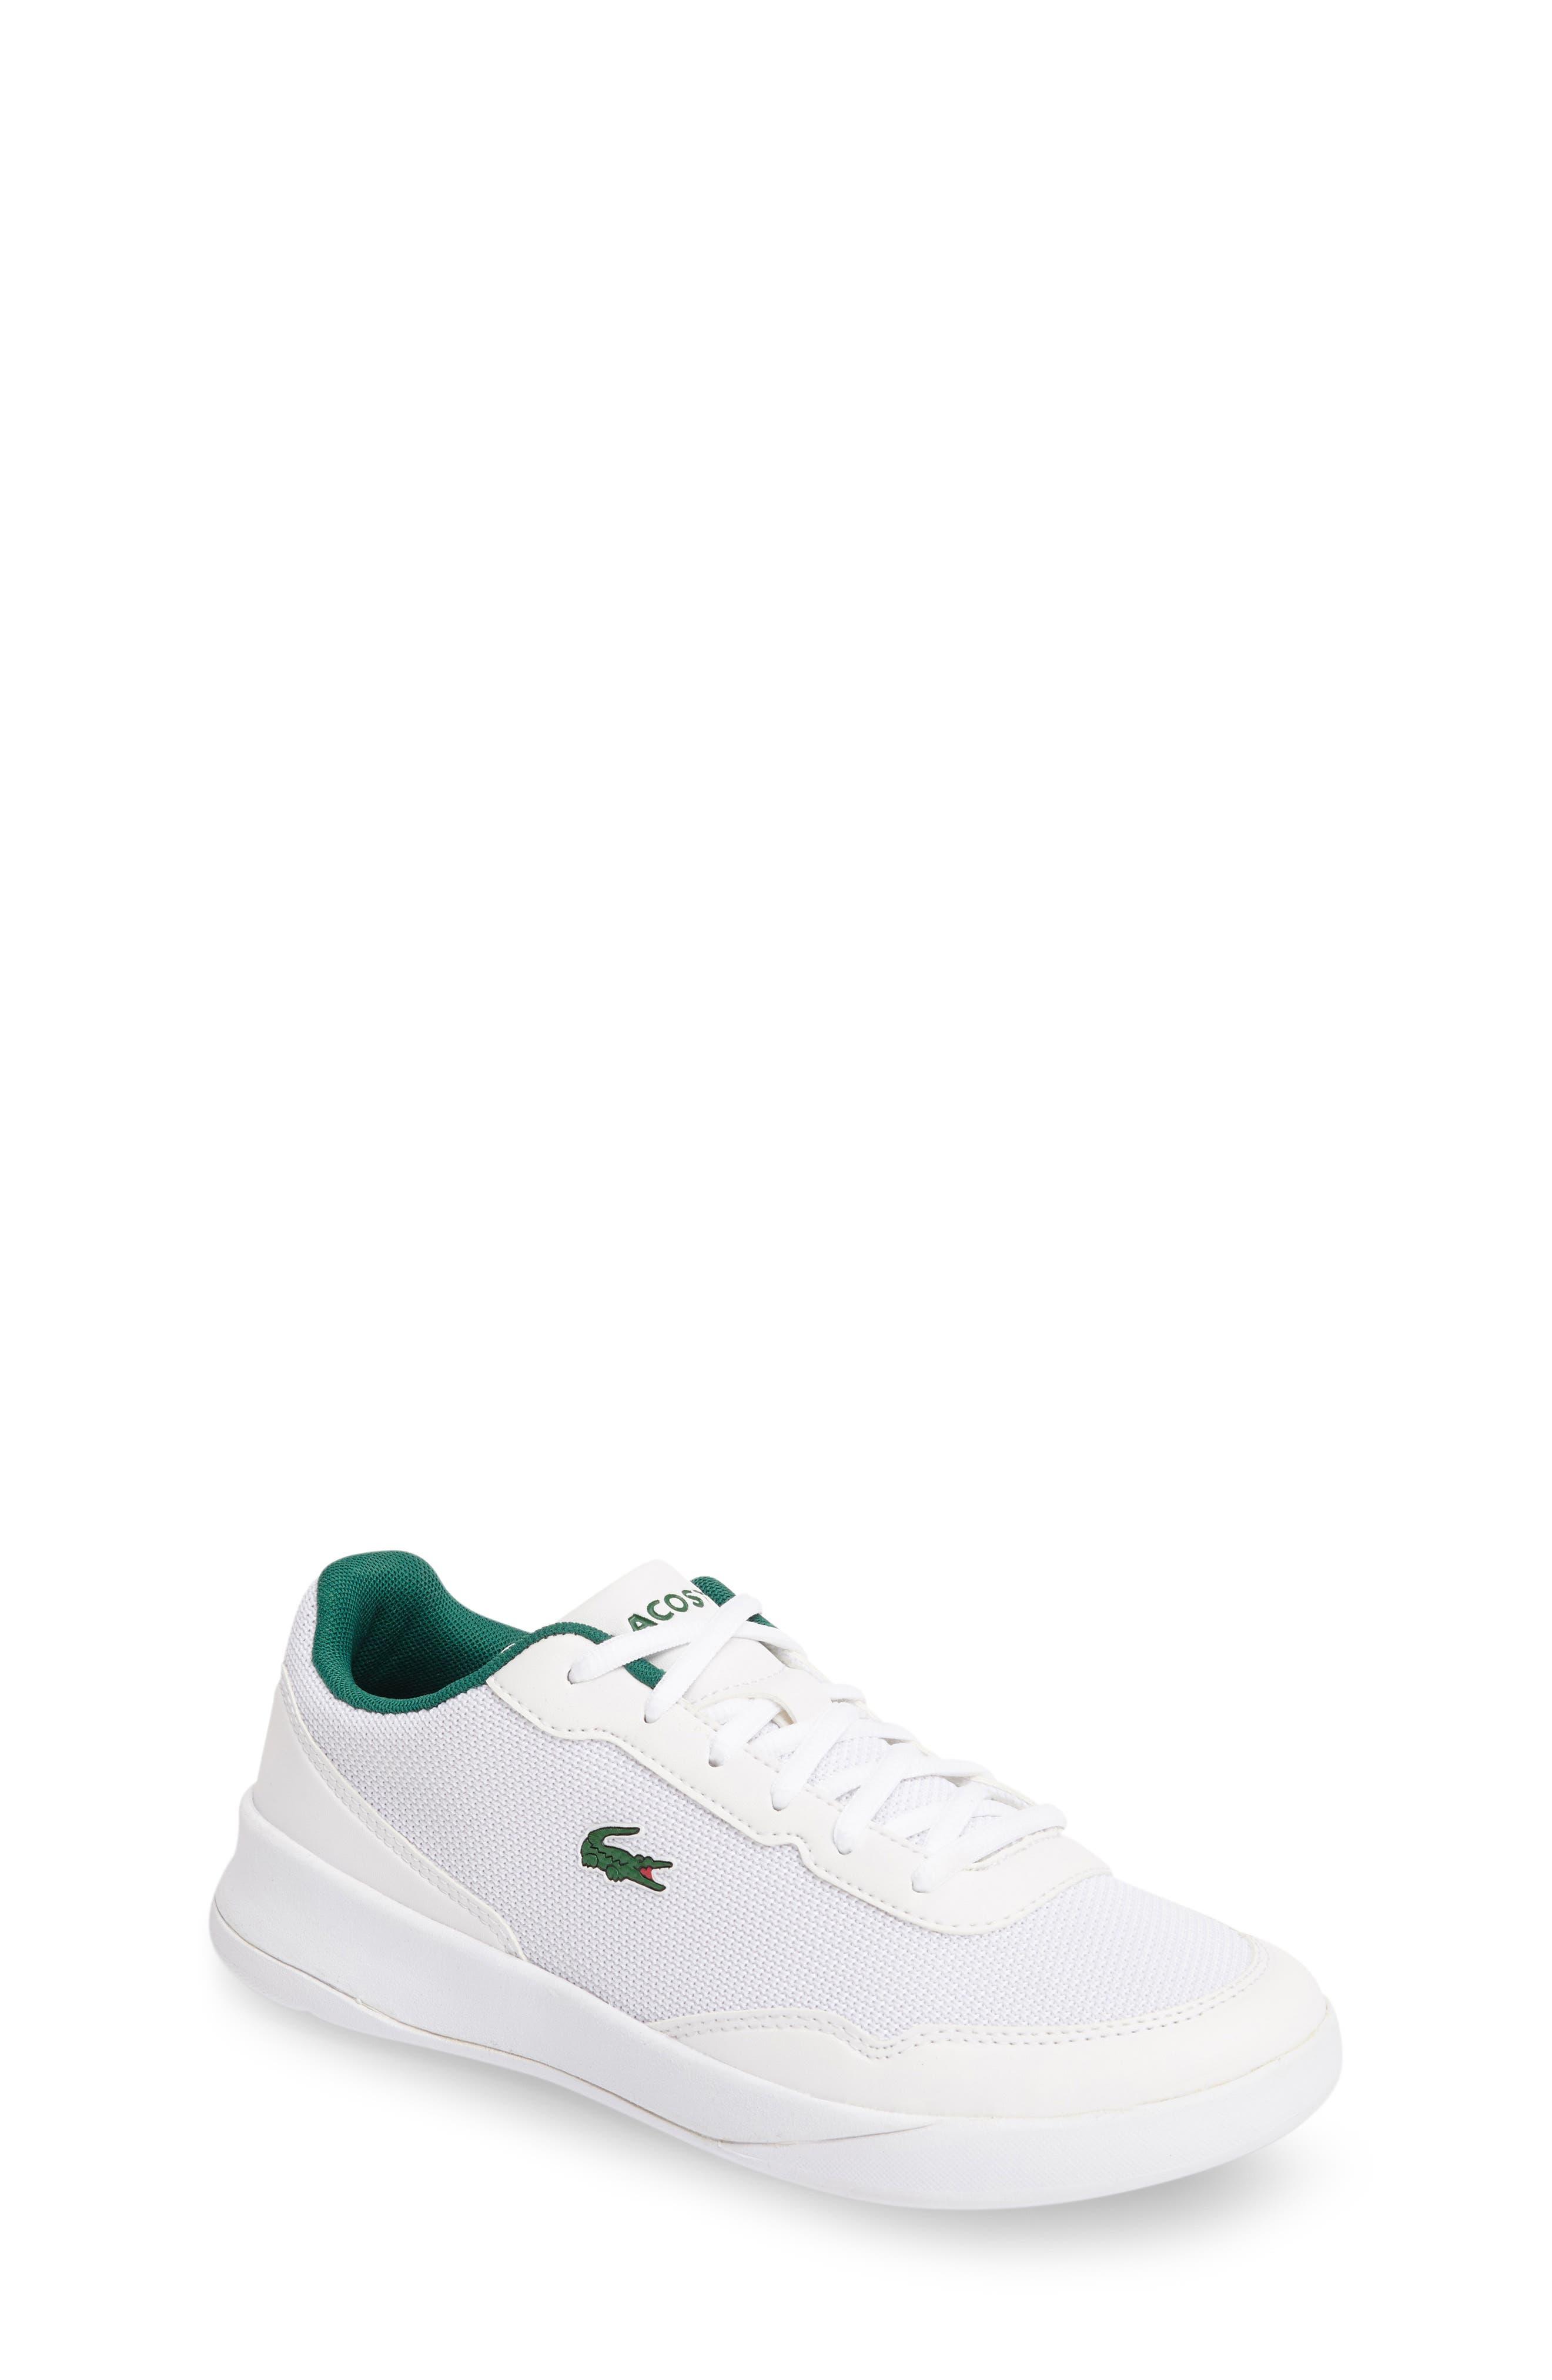 LACOSTE LT Spirit Woven Sneaker